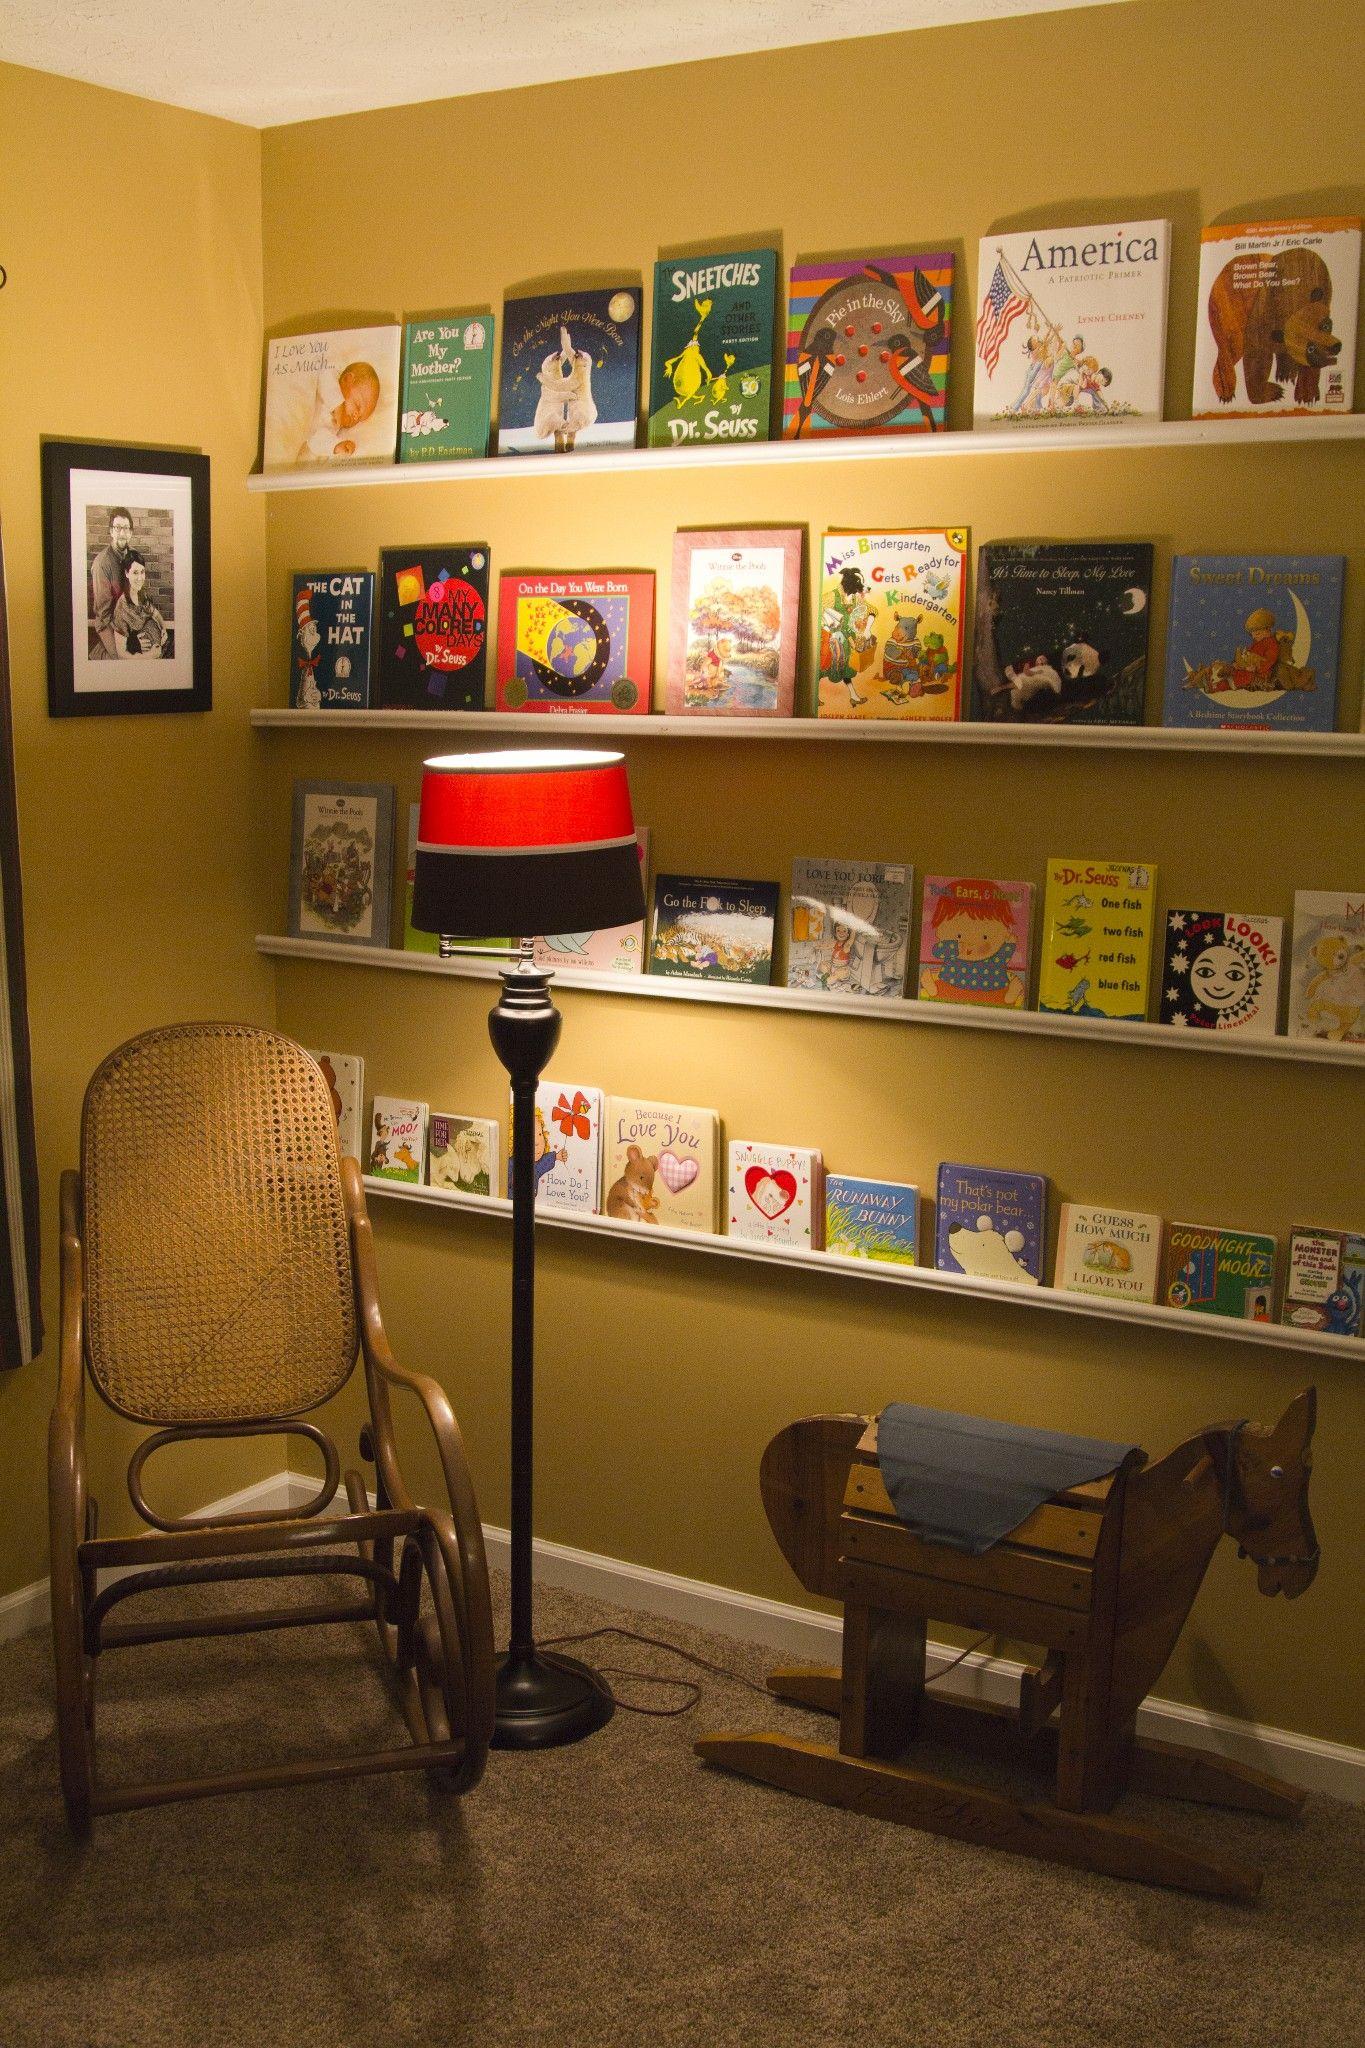 Baby Room Wall Art/ Space Saver Bookshelves (Materials: Four 1x2x8